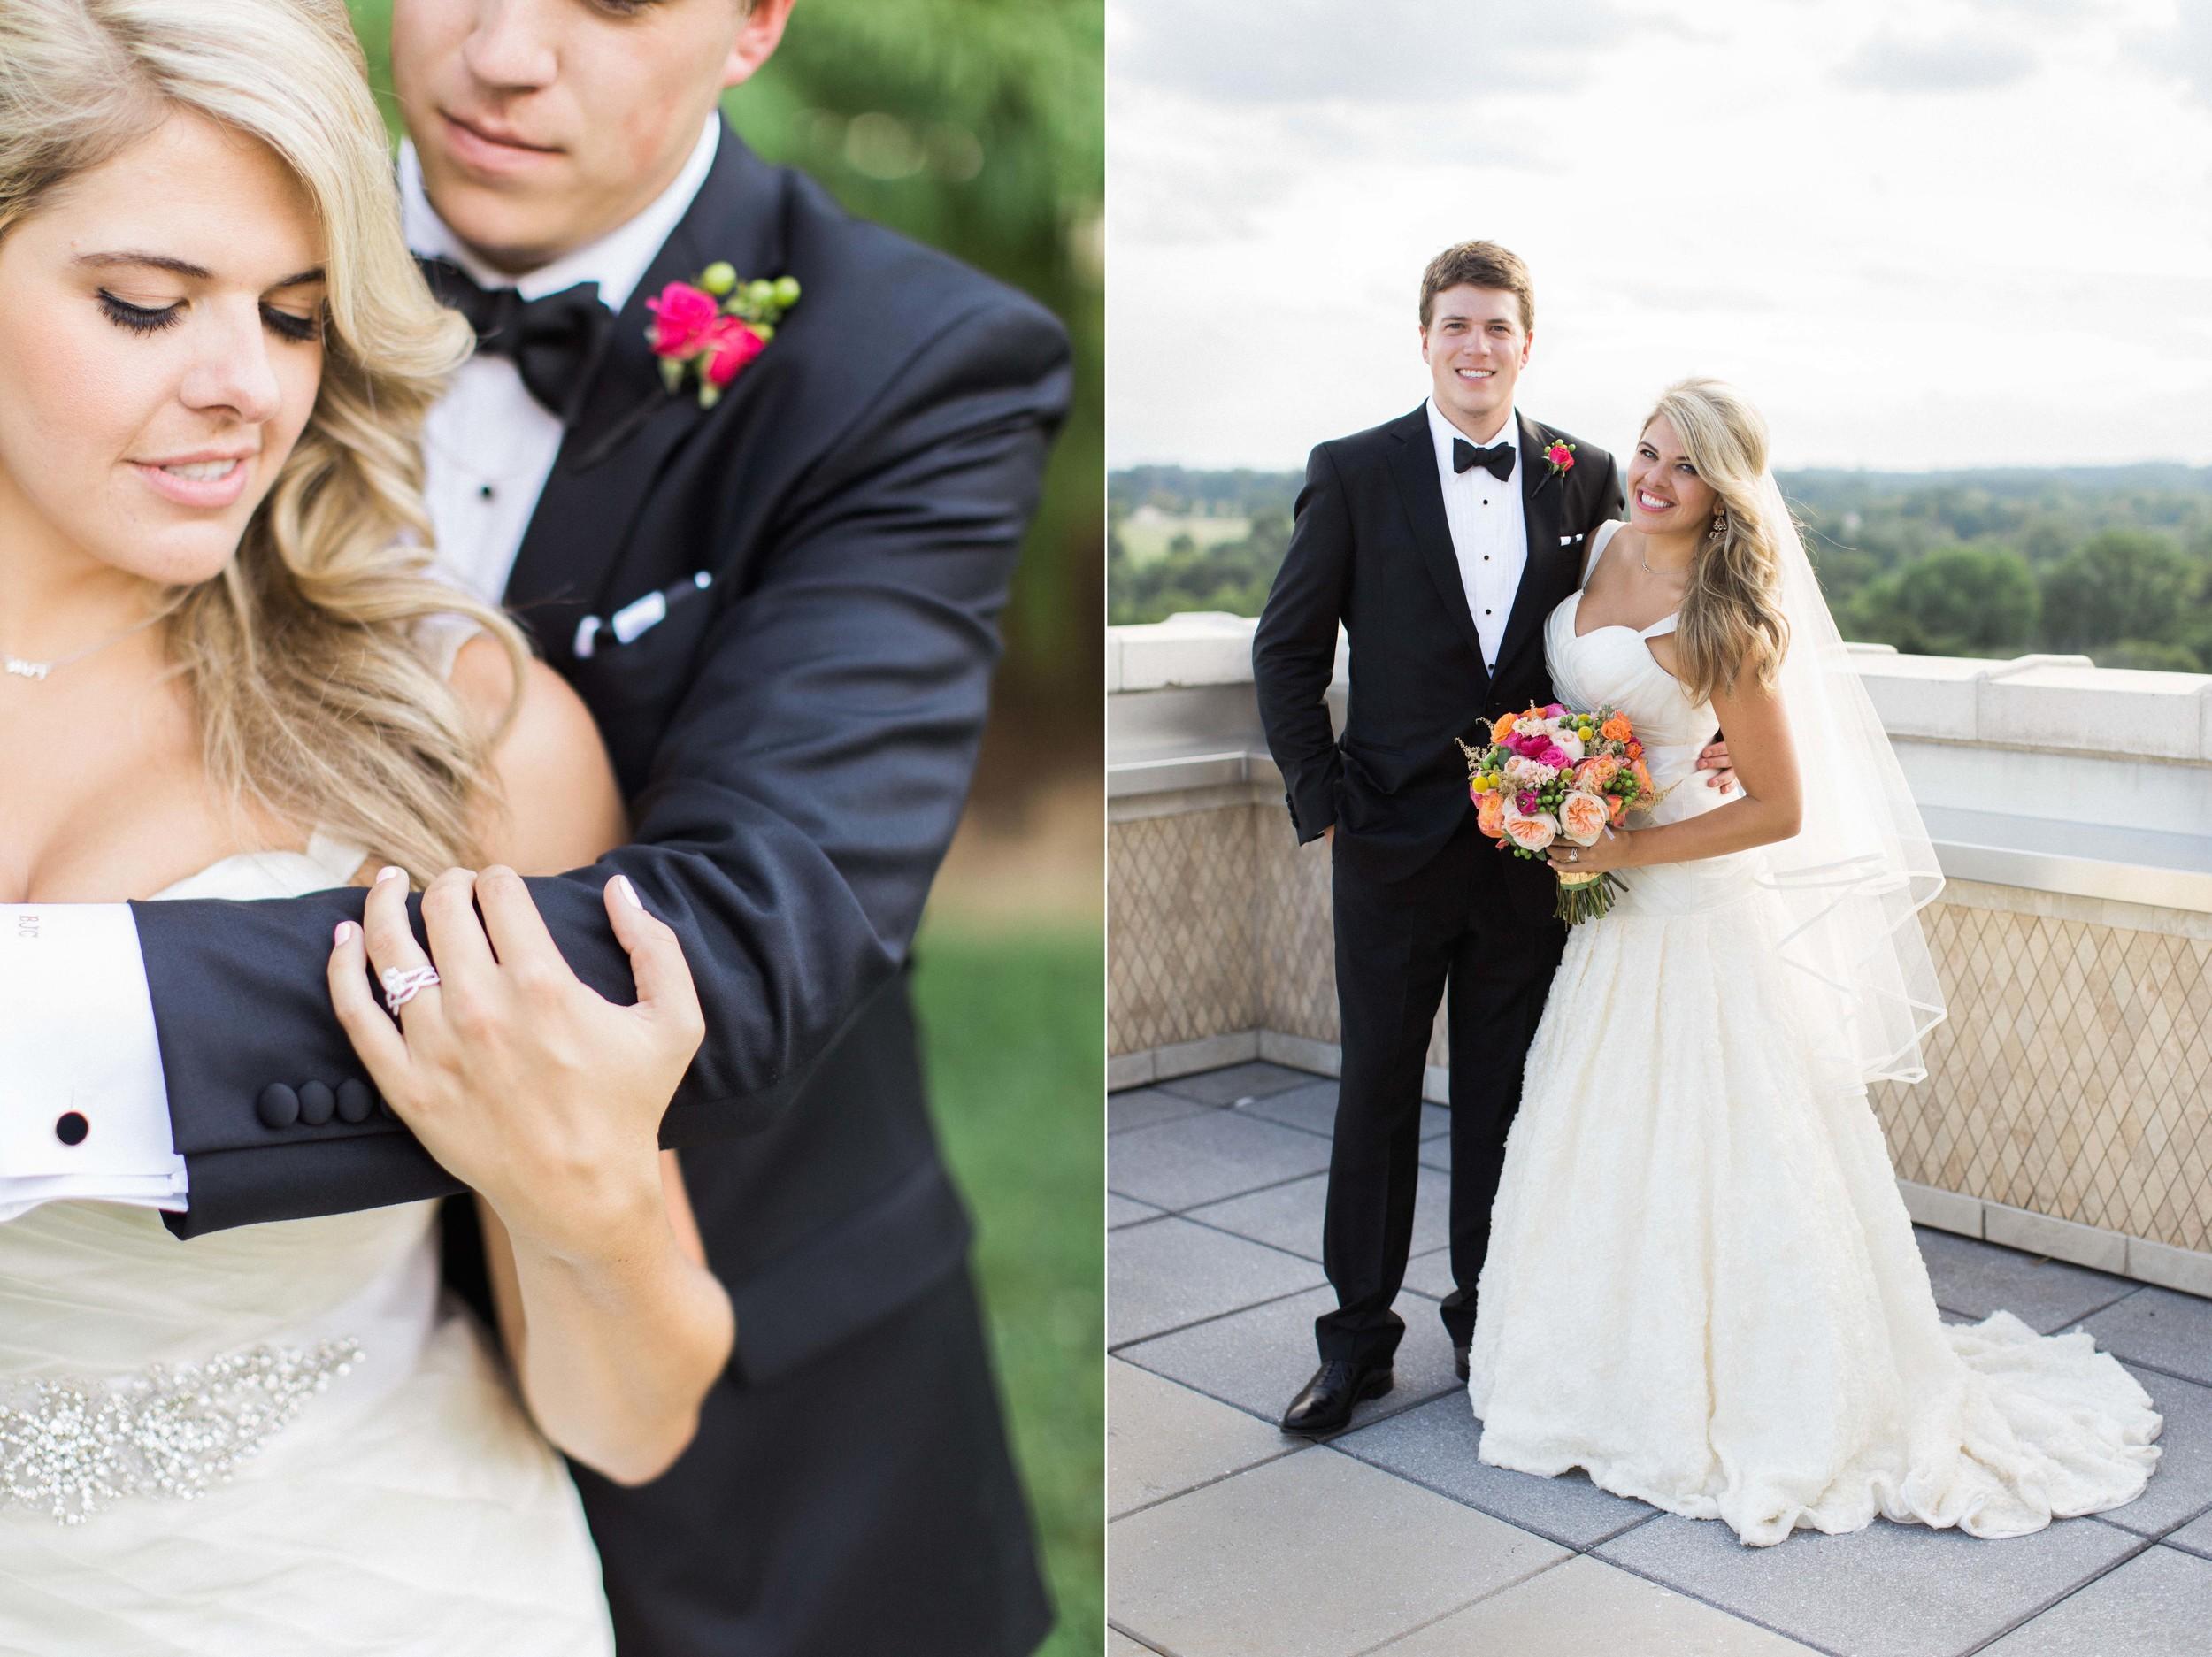 Chase Park Plaza St Louis Wedding Photo-1060 copy.jpg